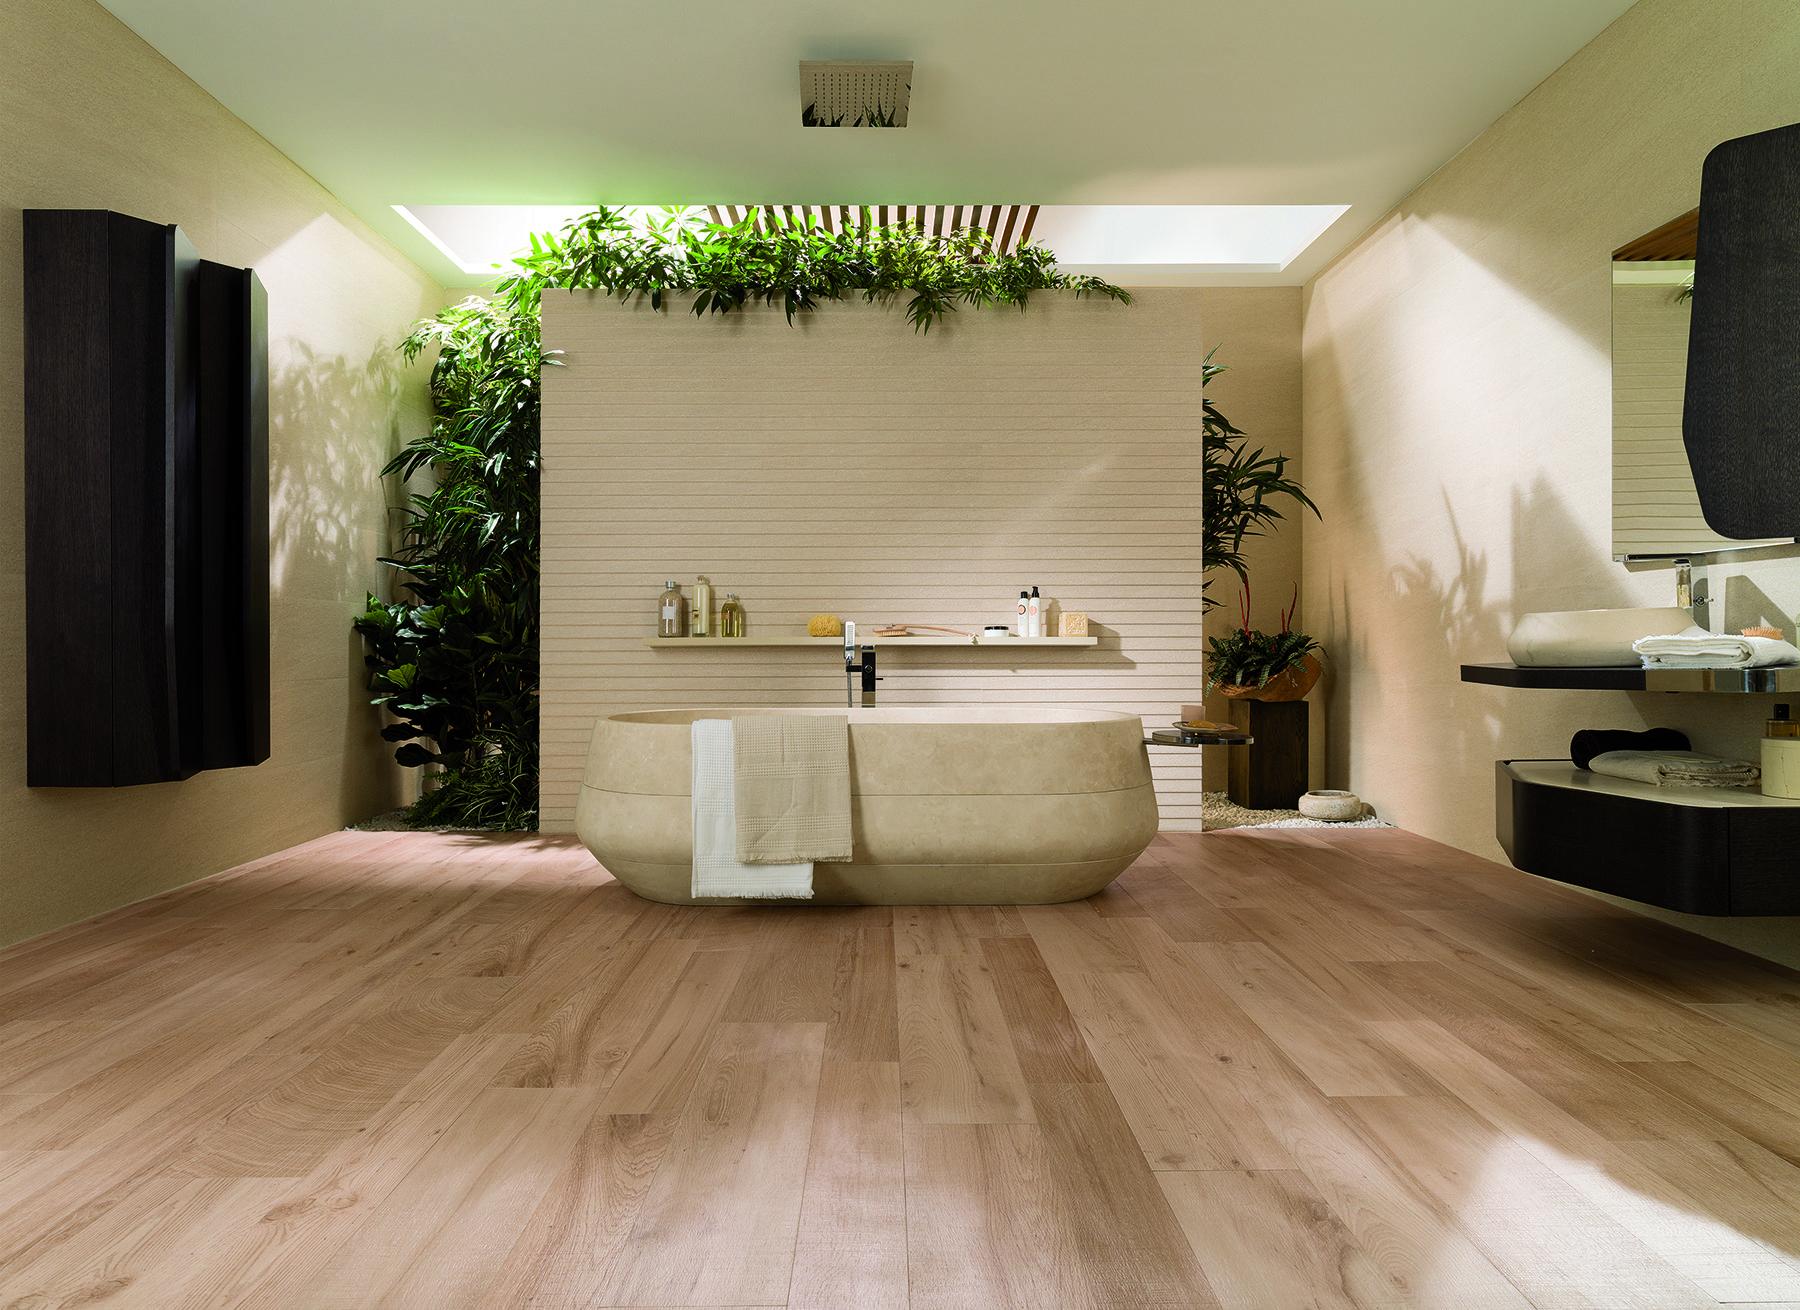 Porcelanosa Ascot Arce | Floors | Pinterest | Muebles de baño ...